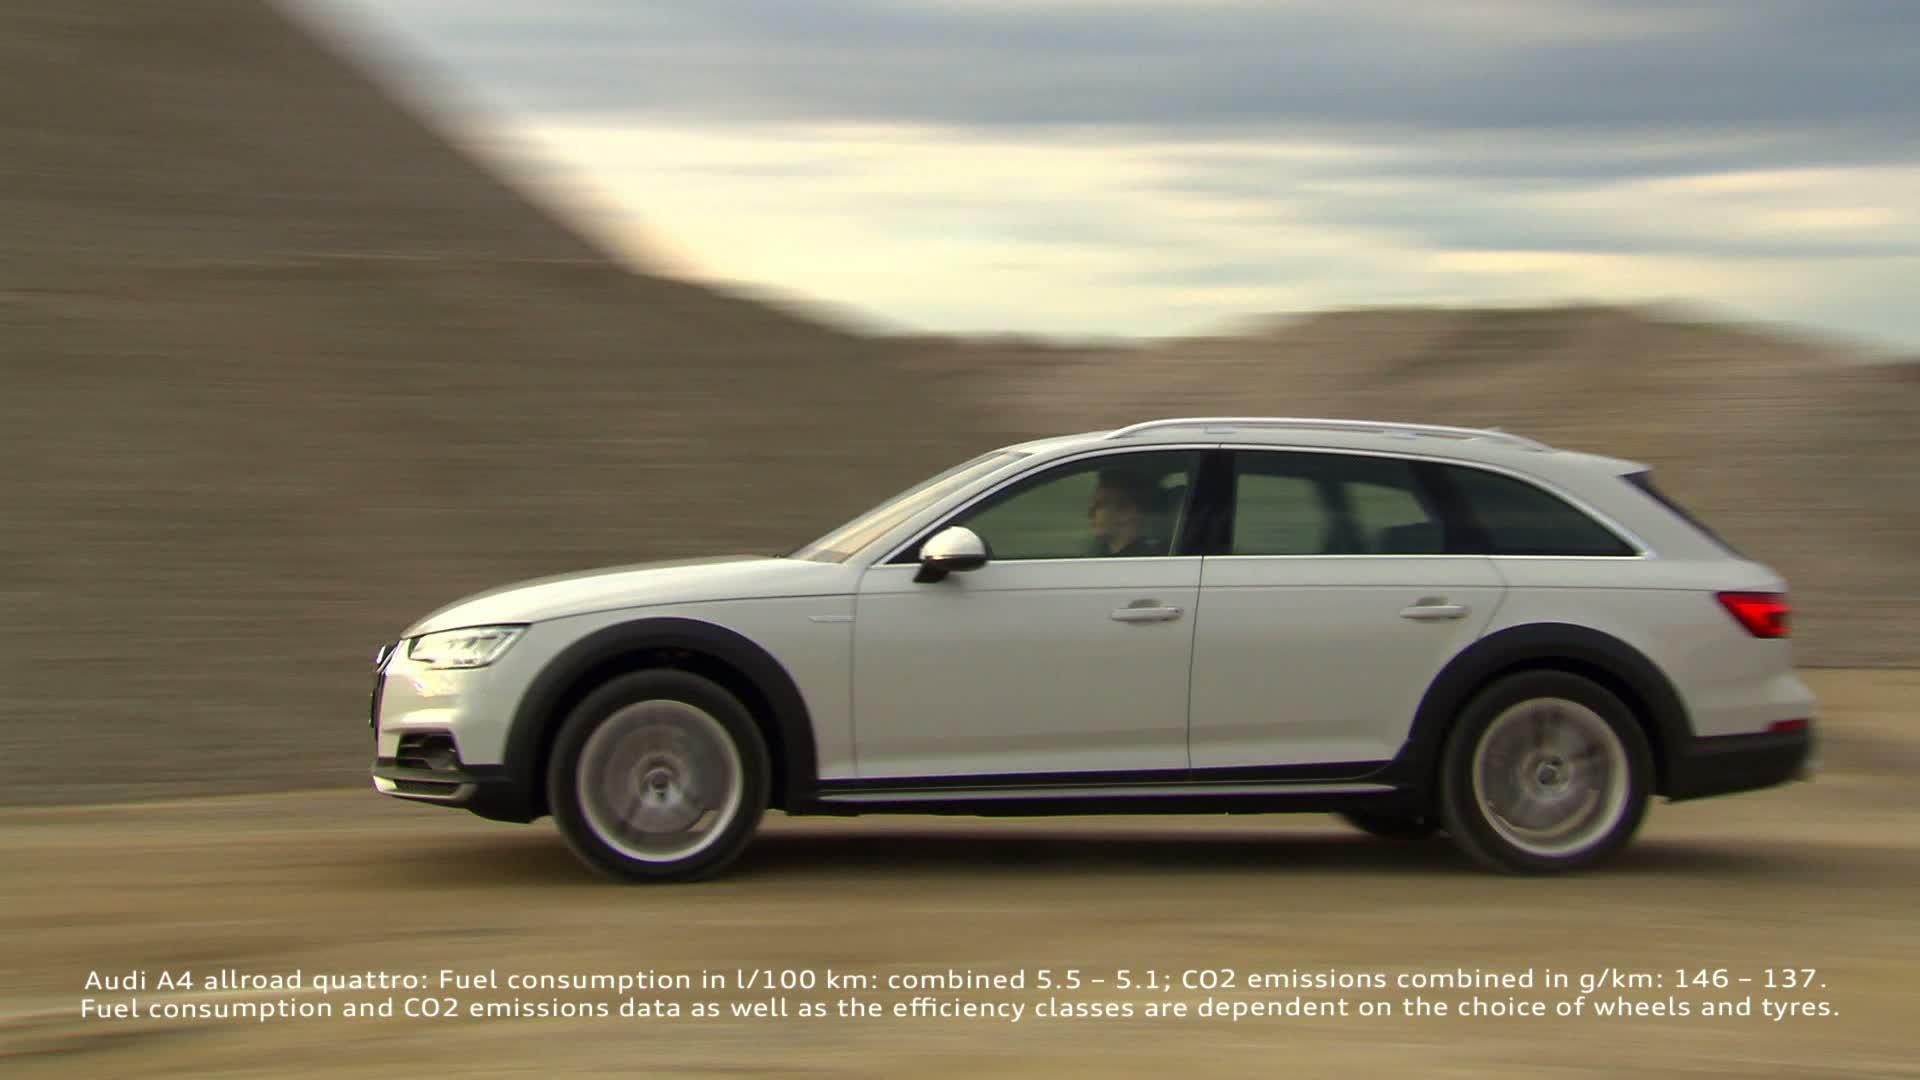 the new audi a4 allroad quattro all round car with off road capabilities video audi mediatv [ 1920 x 1080 Pixel ]